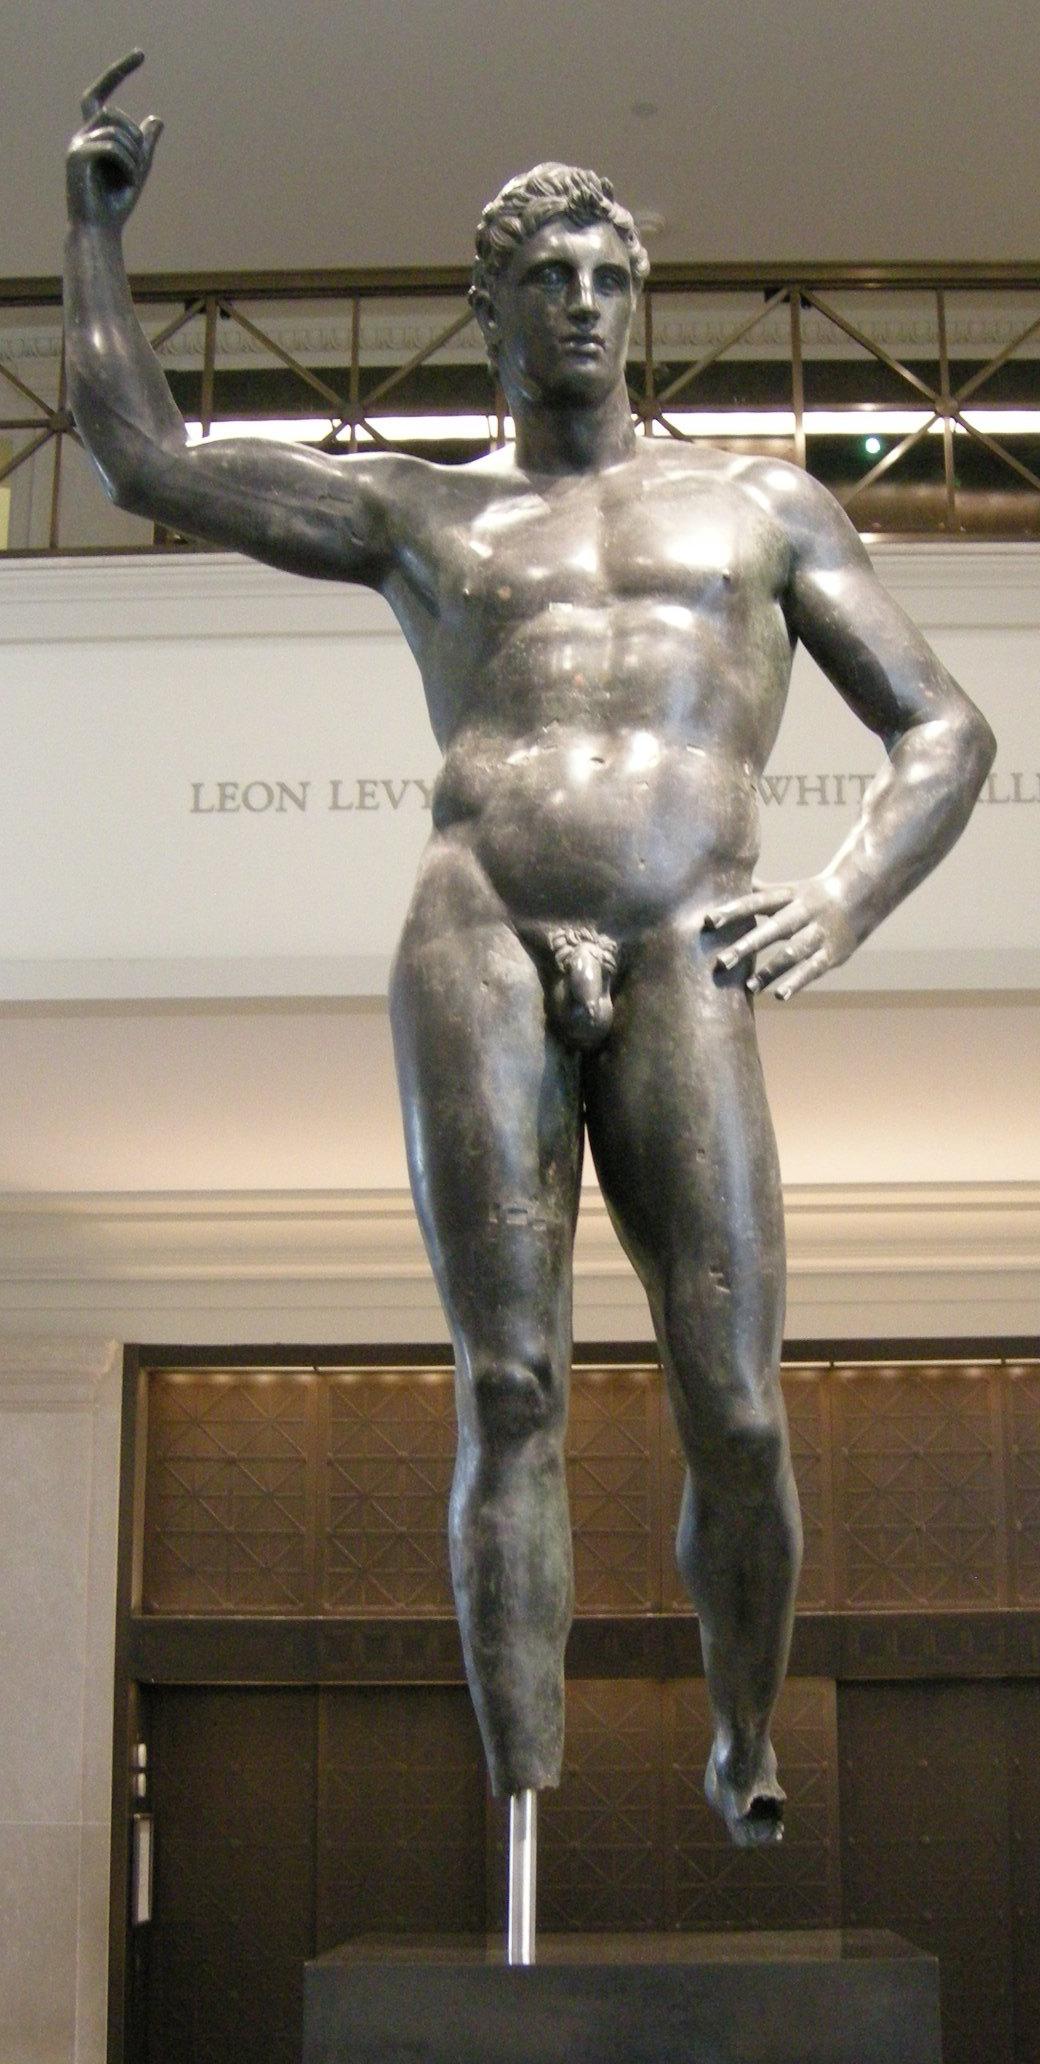 Met,_greek,_hellenistic,_bronze_statue_of_a_man,_mid_2nd-1st_century_BC.JPG